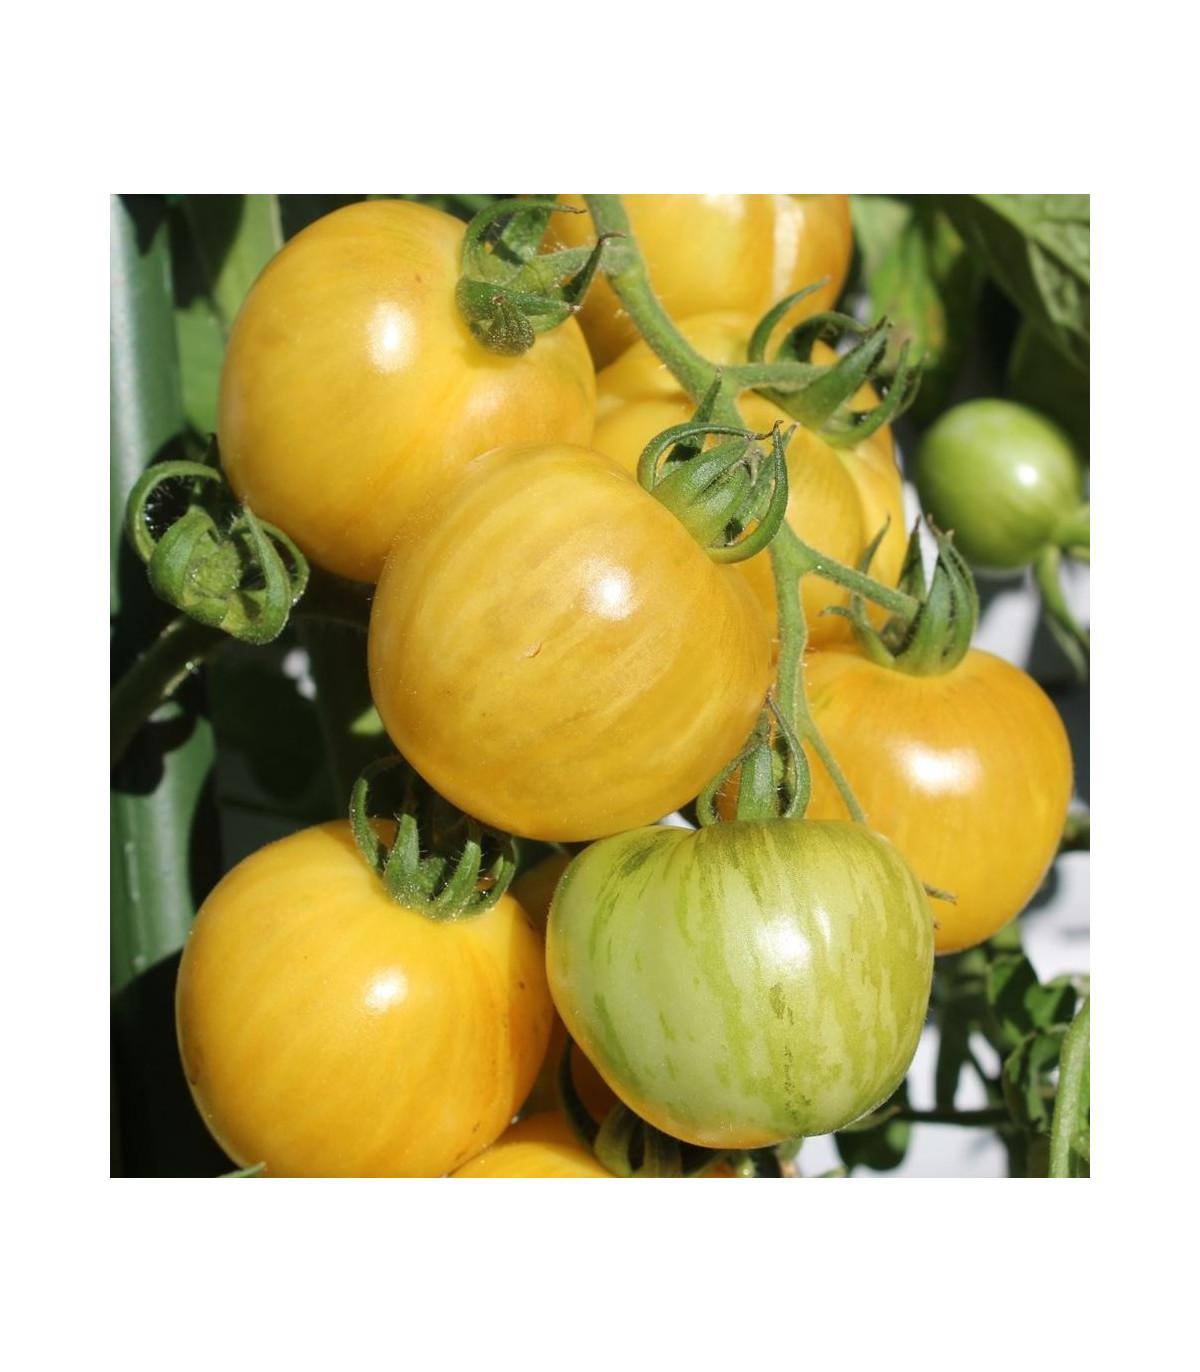 BIO paradajka kolíková Topaz - Lycopersicon esculentum - rajčiak - bio semená rajčiaka - 6 ks